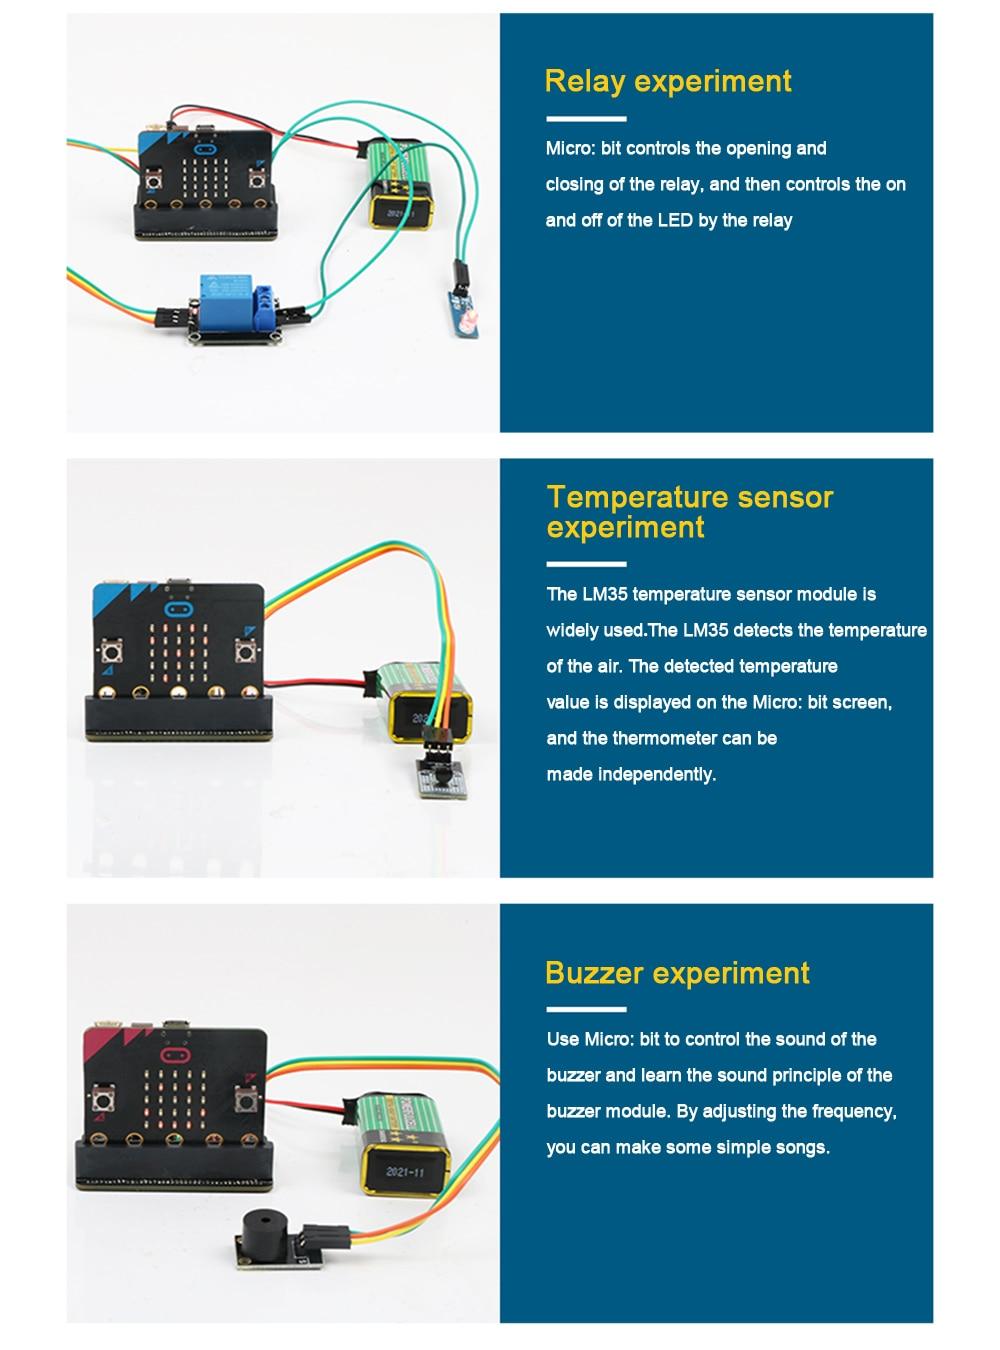 All In One Keywish Starter Diy Kit for Micro:Bit